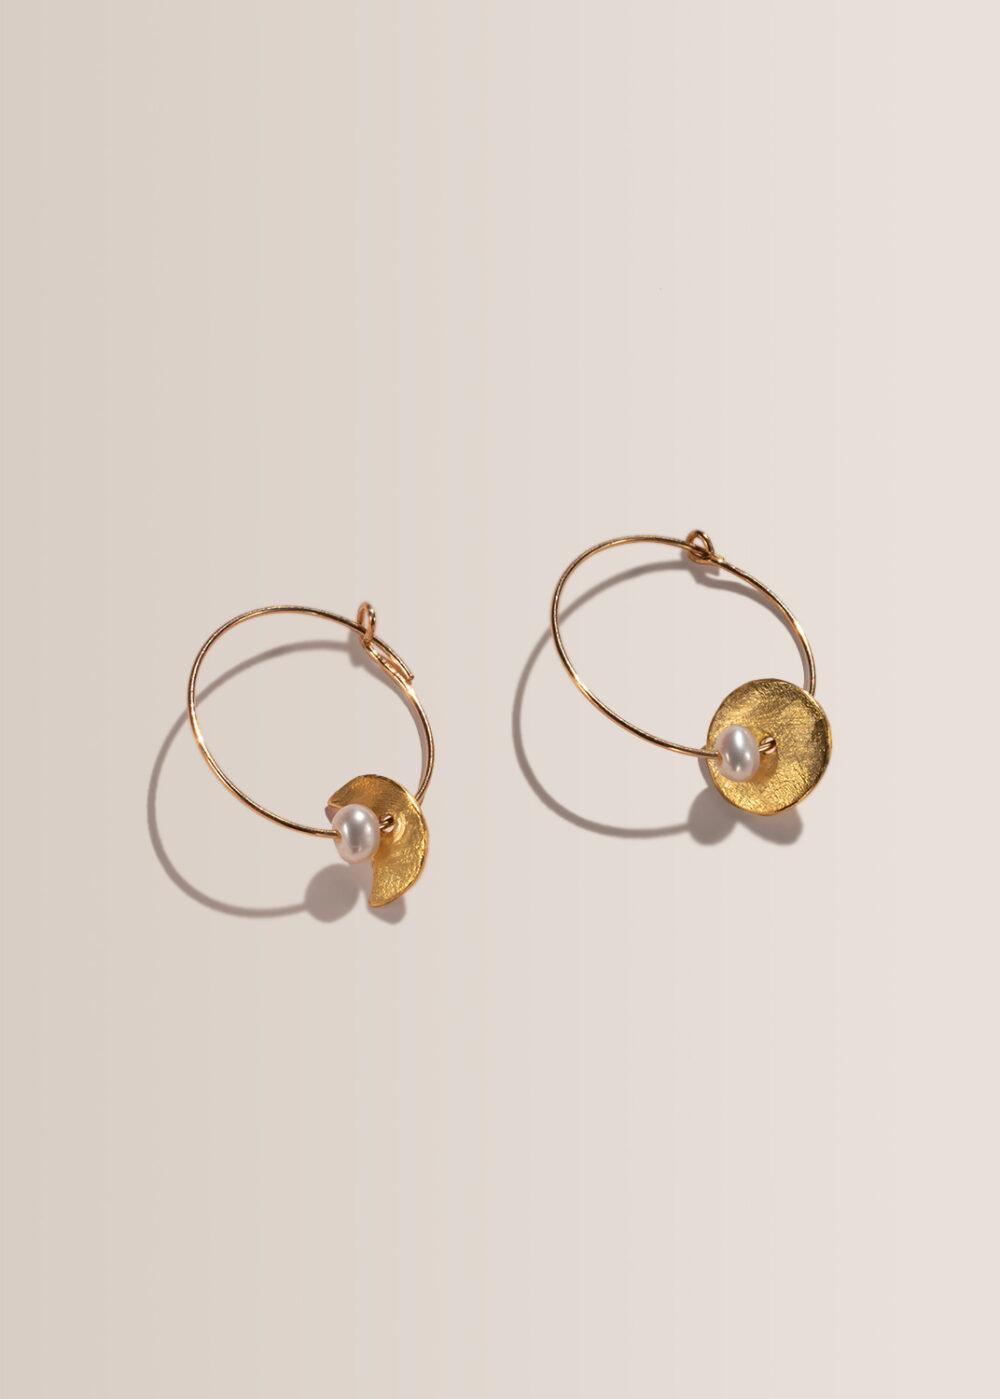 Selini-Sonne-Mond-Creolen-gold-Perlen